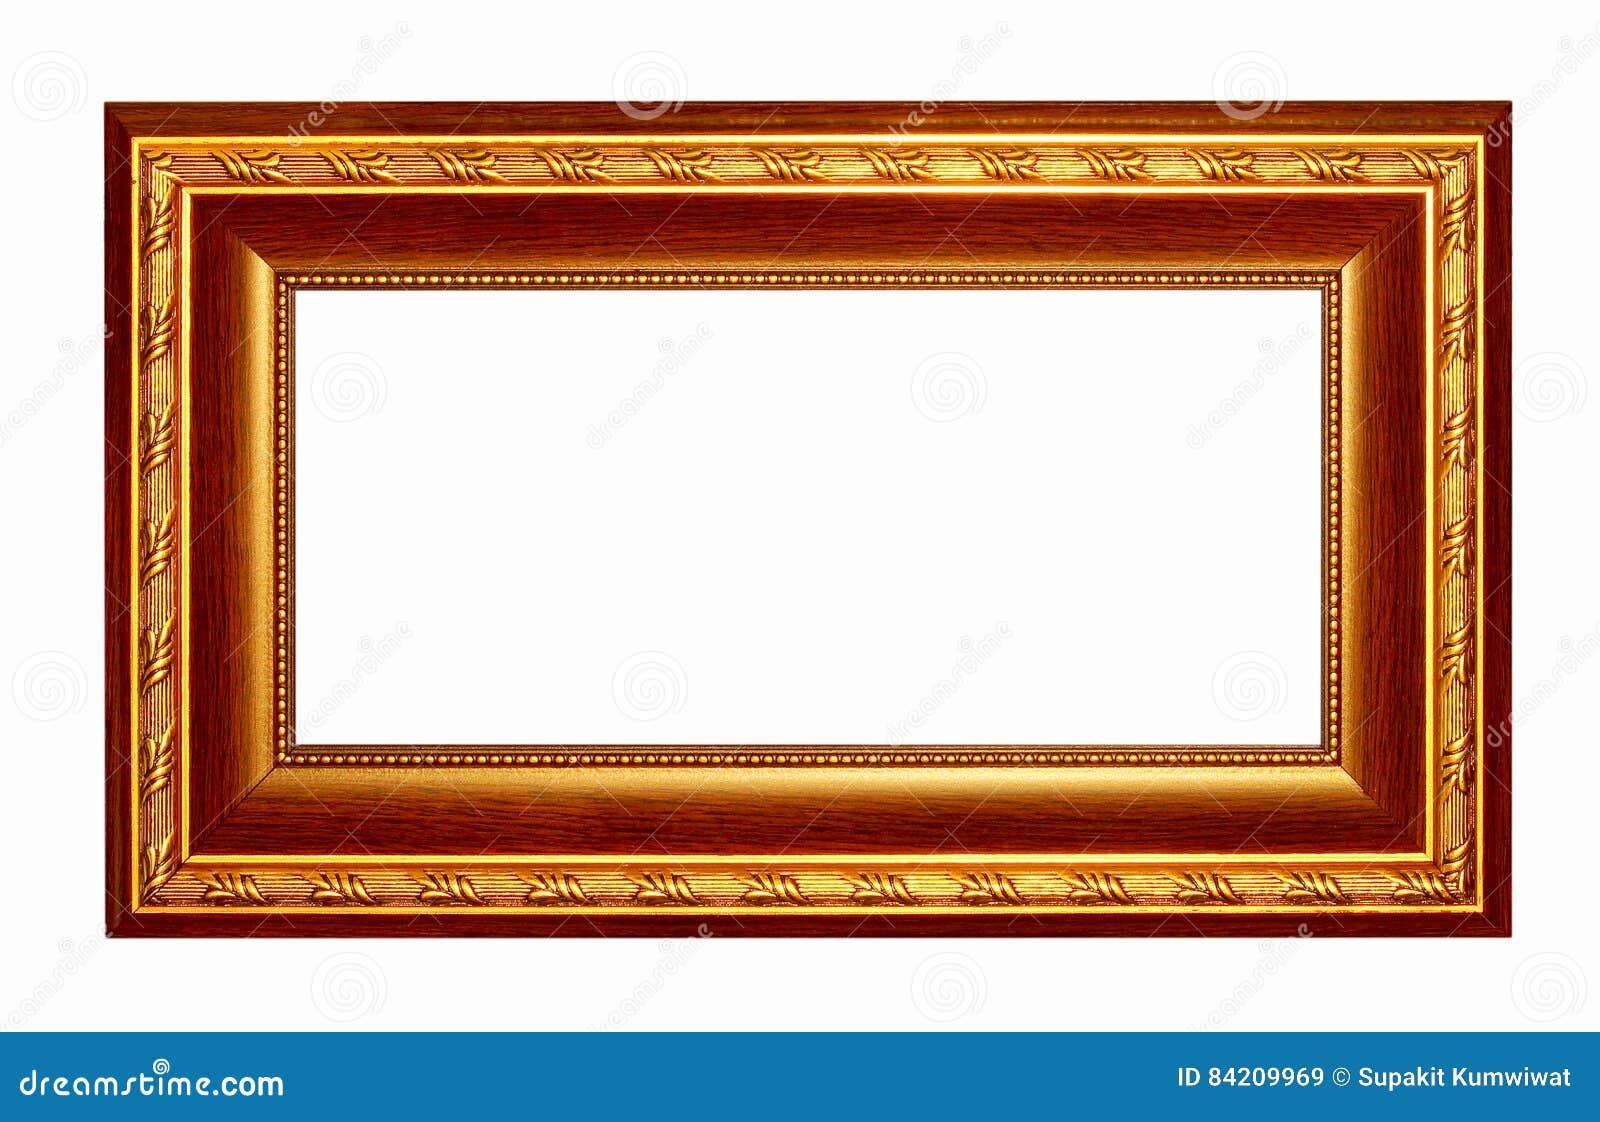 Picture Frame Gold Dark Tones Wood Frame Stock Image - Image of gold ...